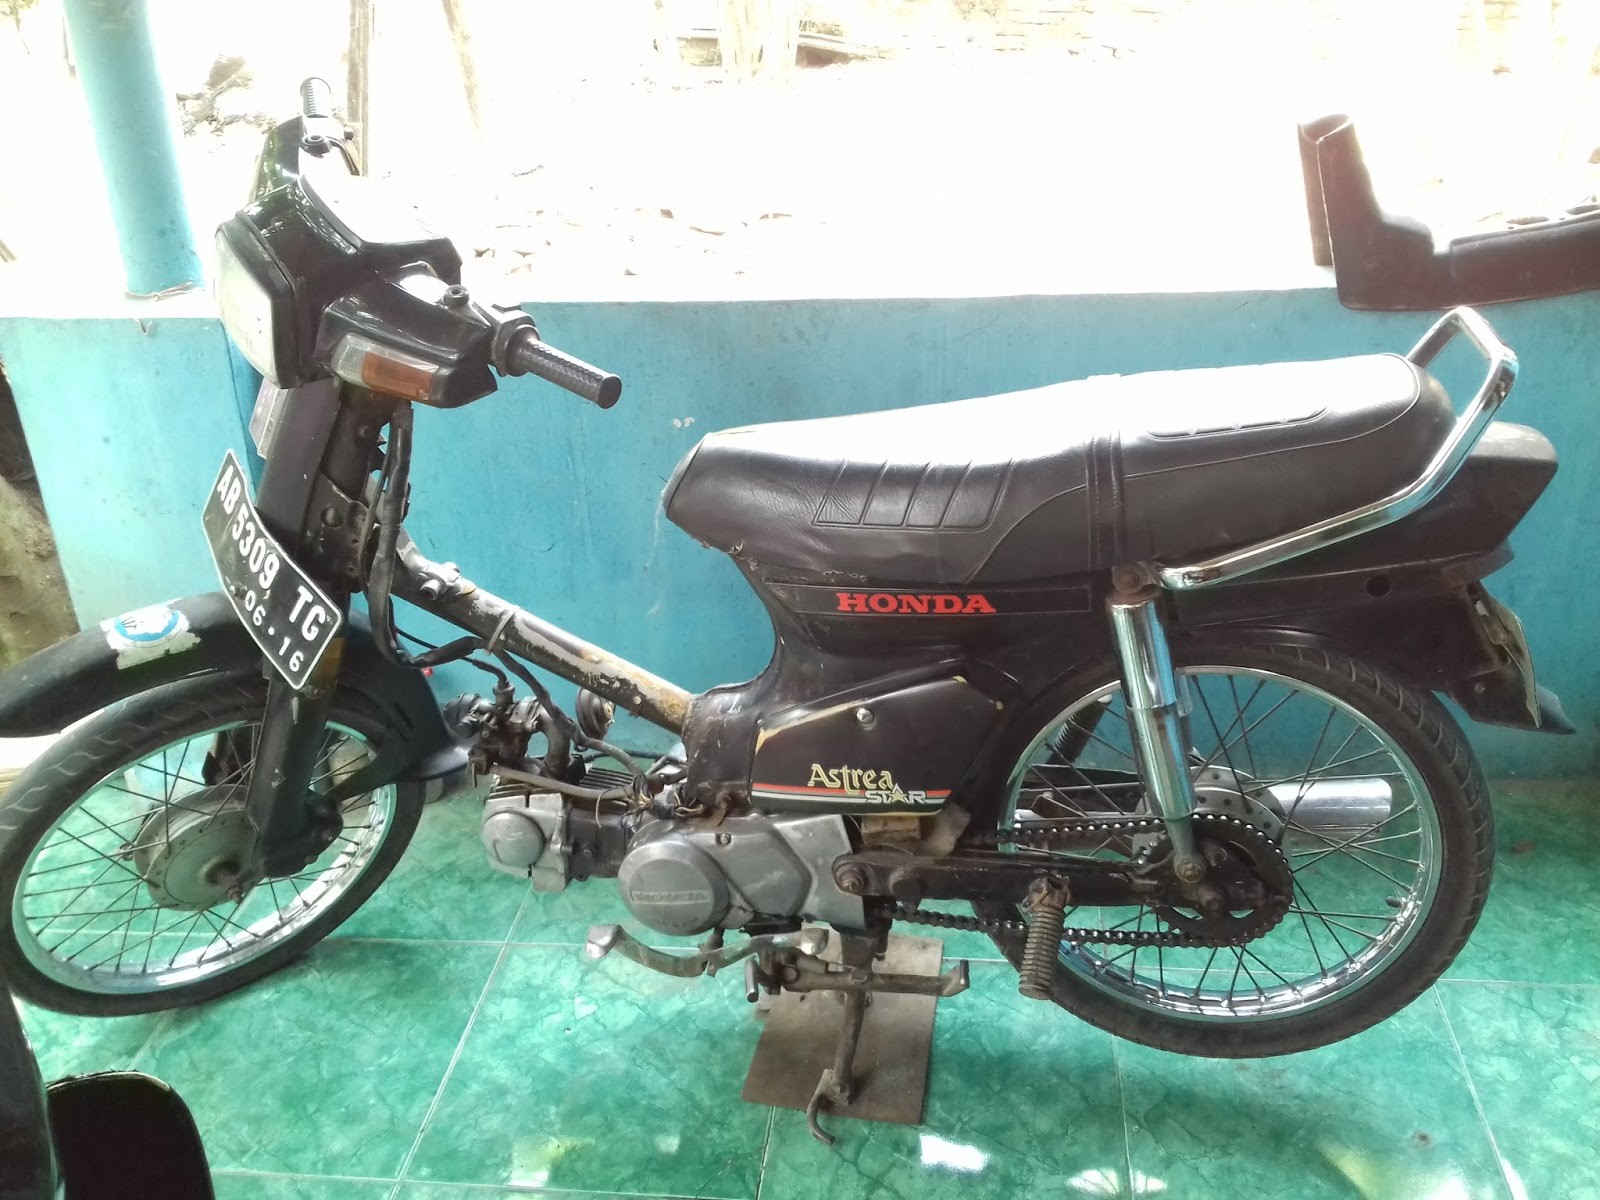 Toko Bagus Motor Bekas Honda Yogyakarta | caferacer.1firts.com